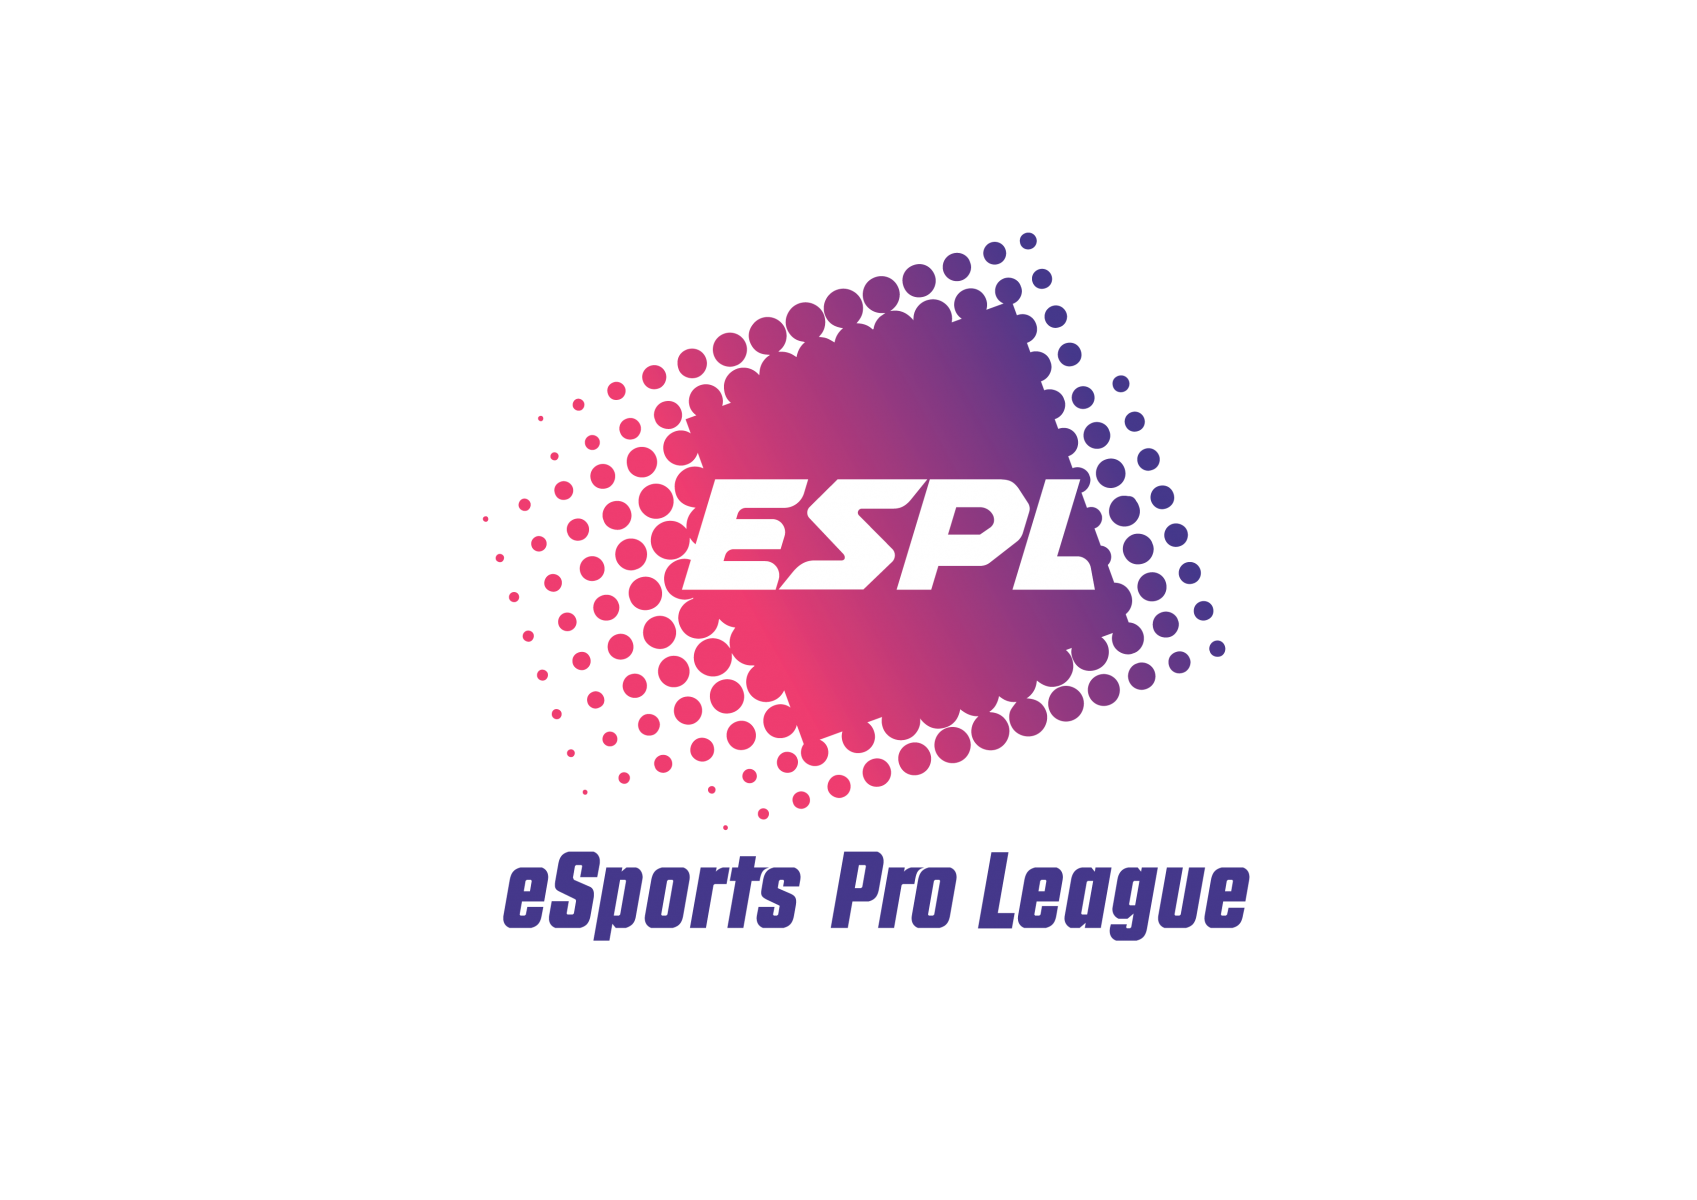 esports pro league logo